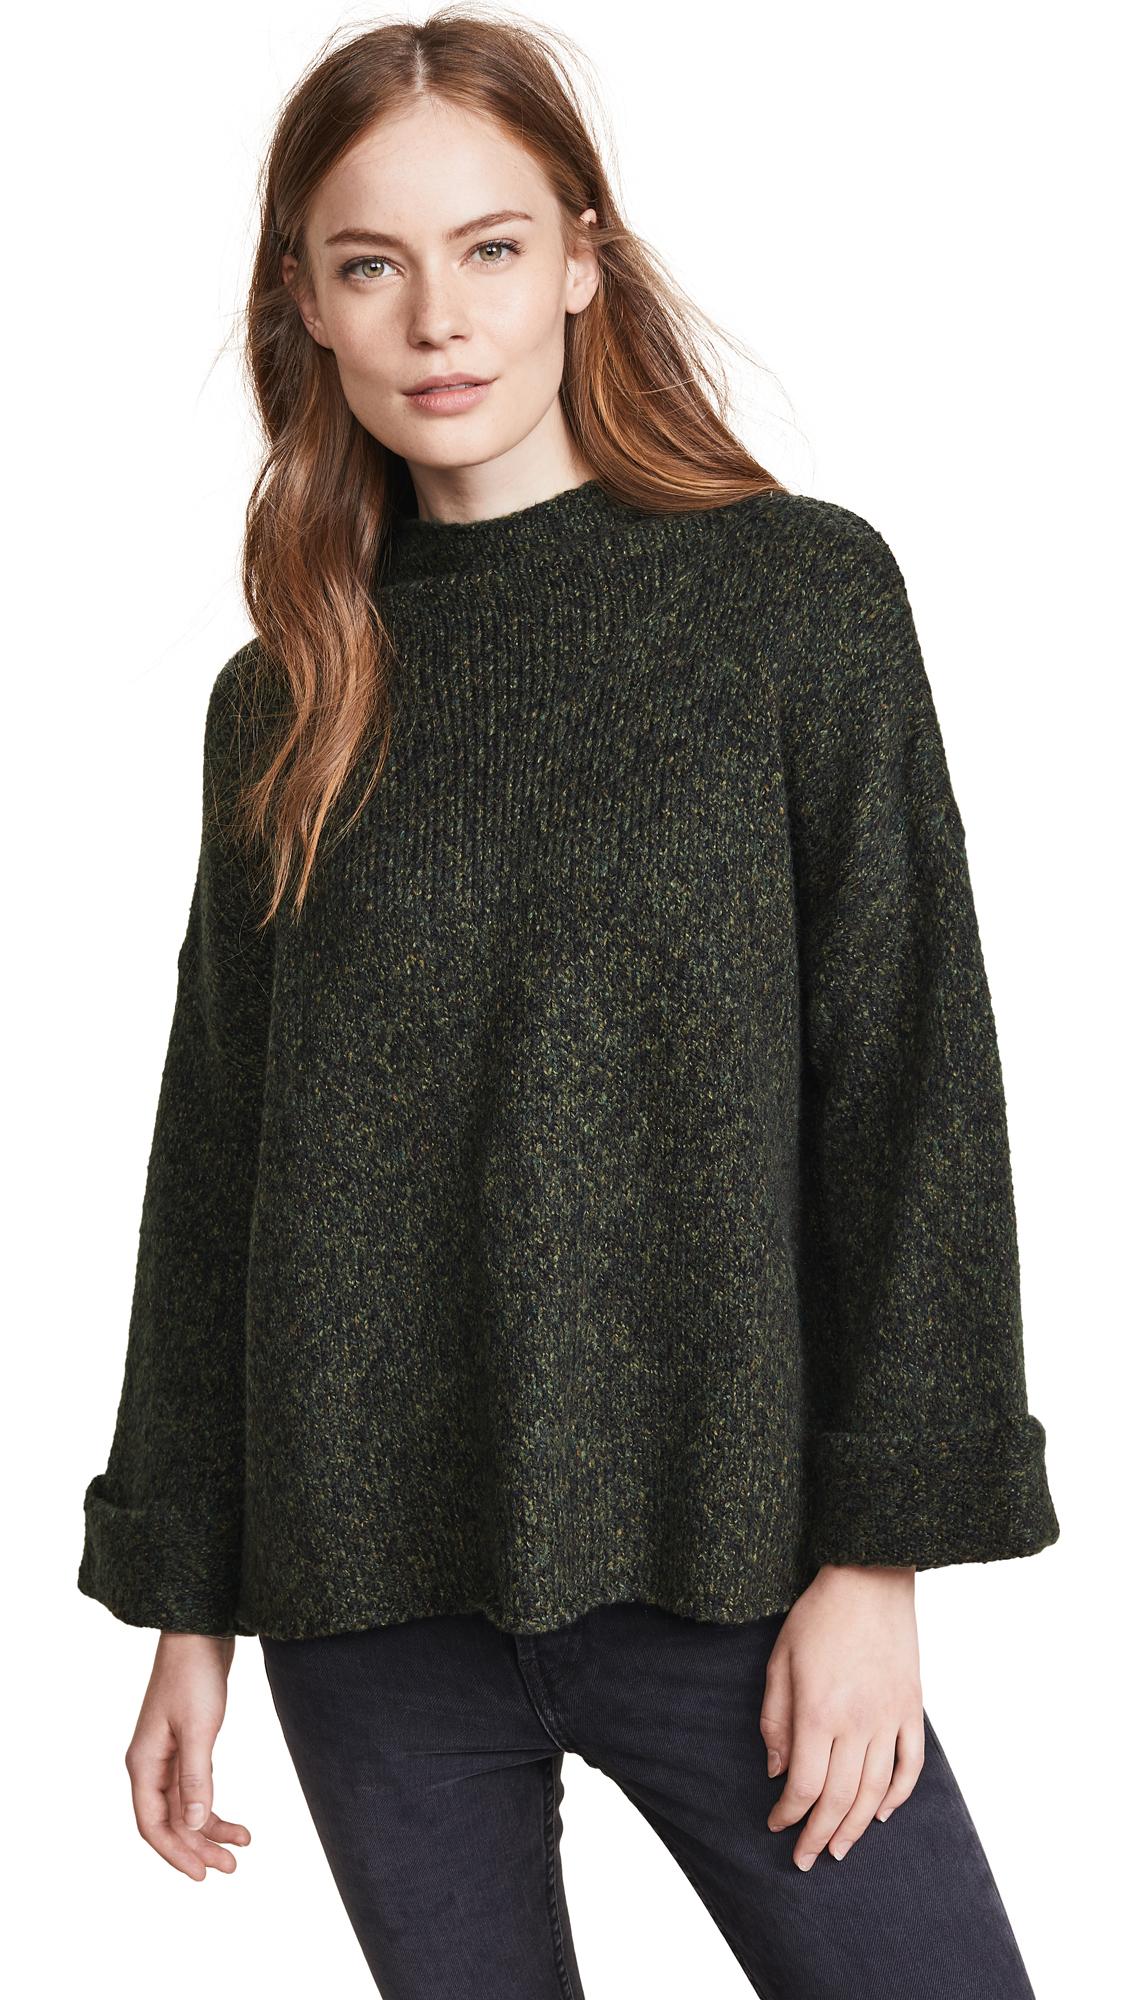 LINE Kira Funnel Neck Sweater in Crocodile